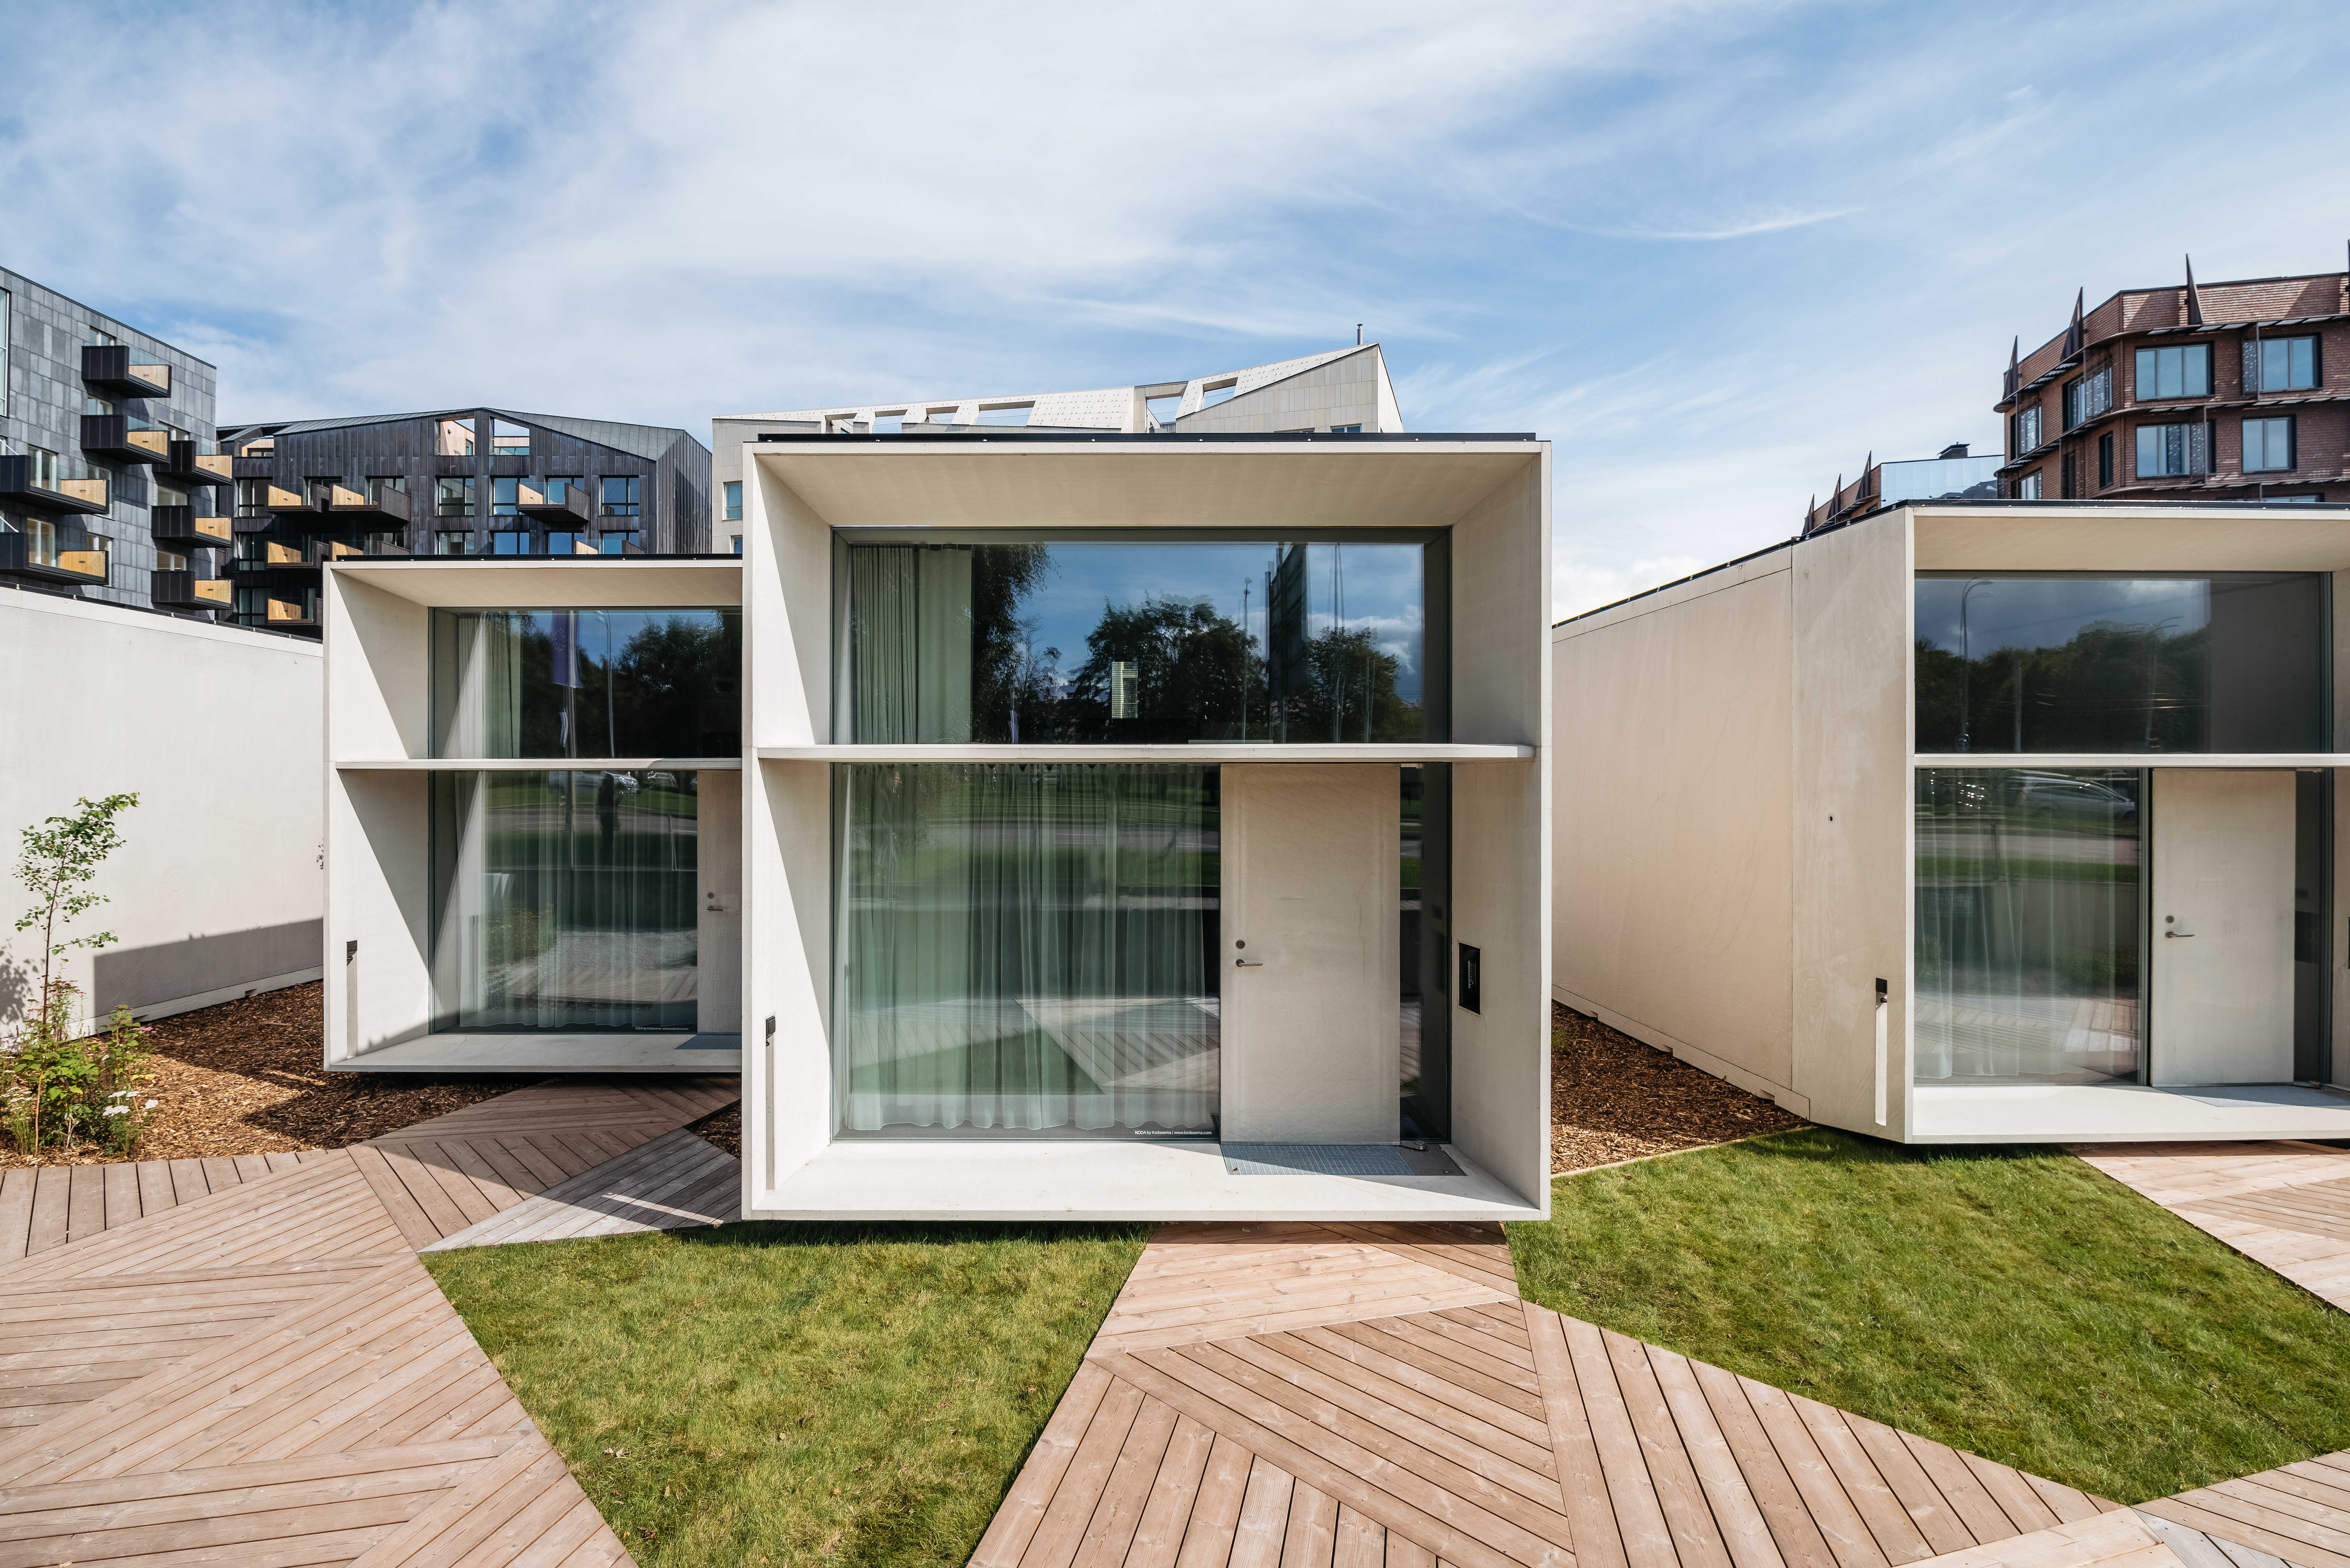 maison écologique KODA